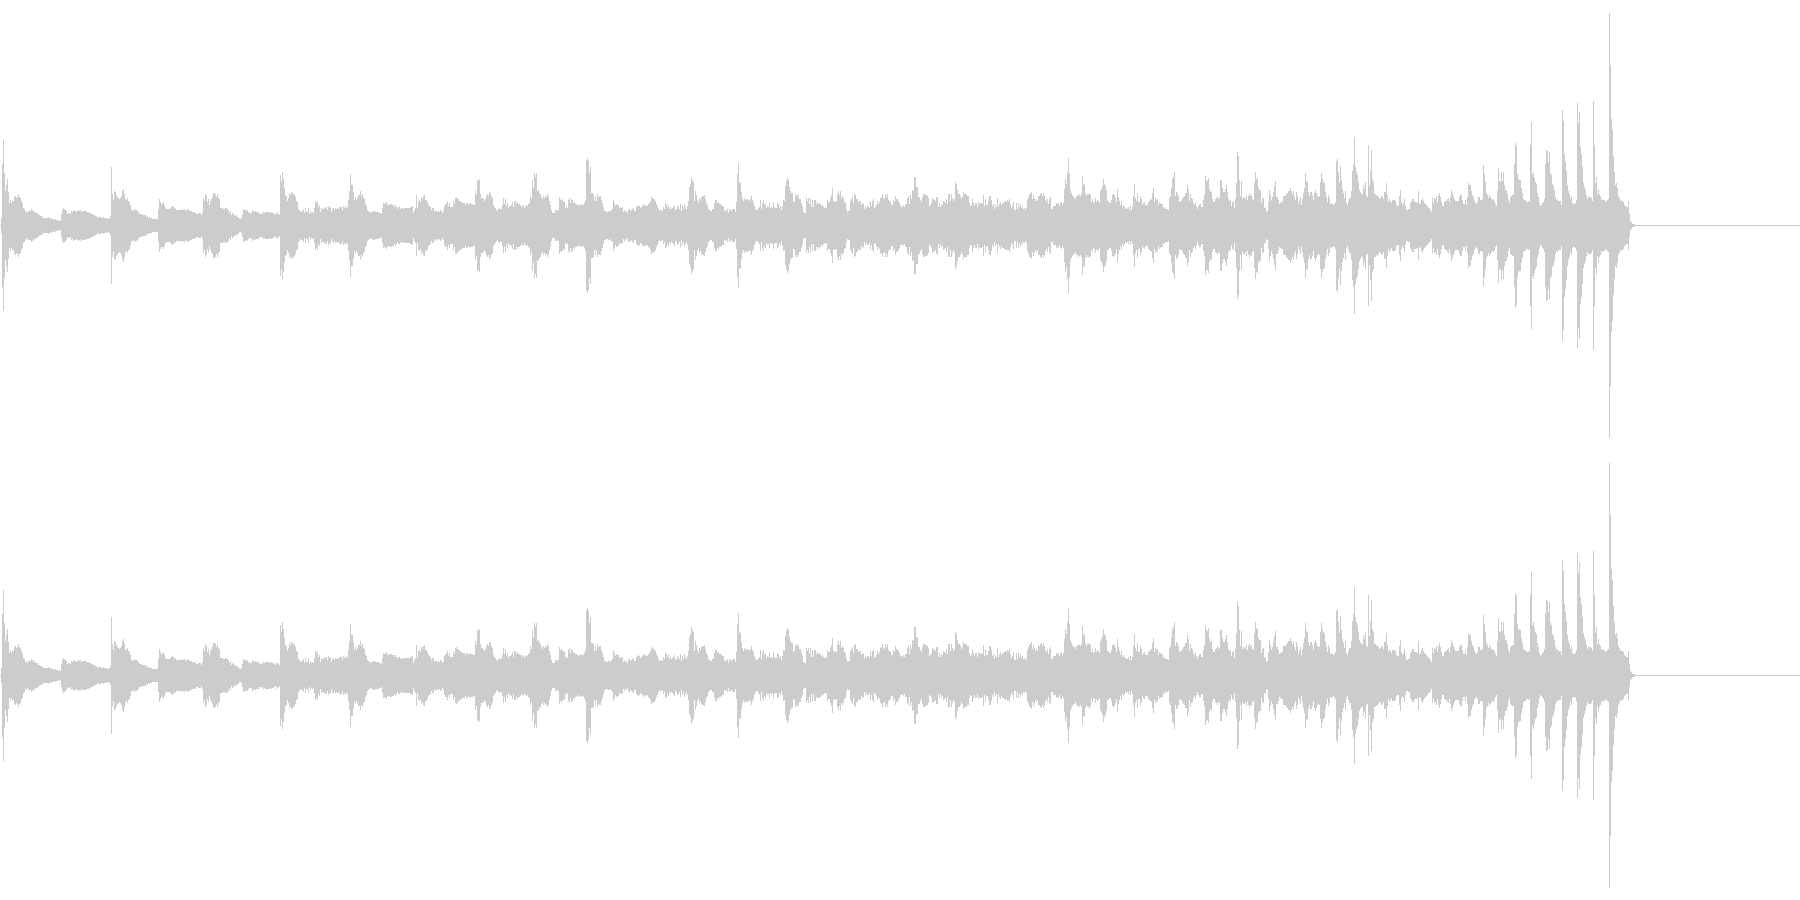 生演奏 琵琶 武士 和風 古典風#24の未再生の波形